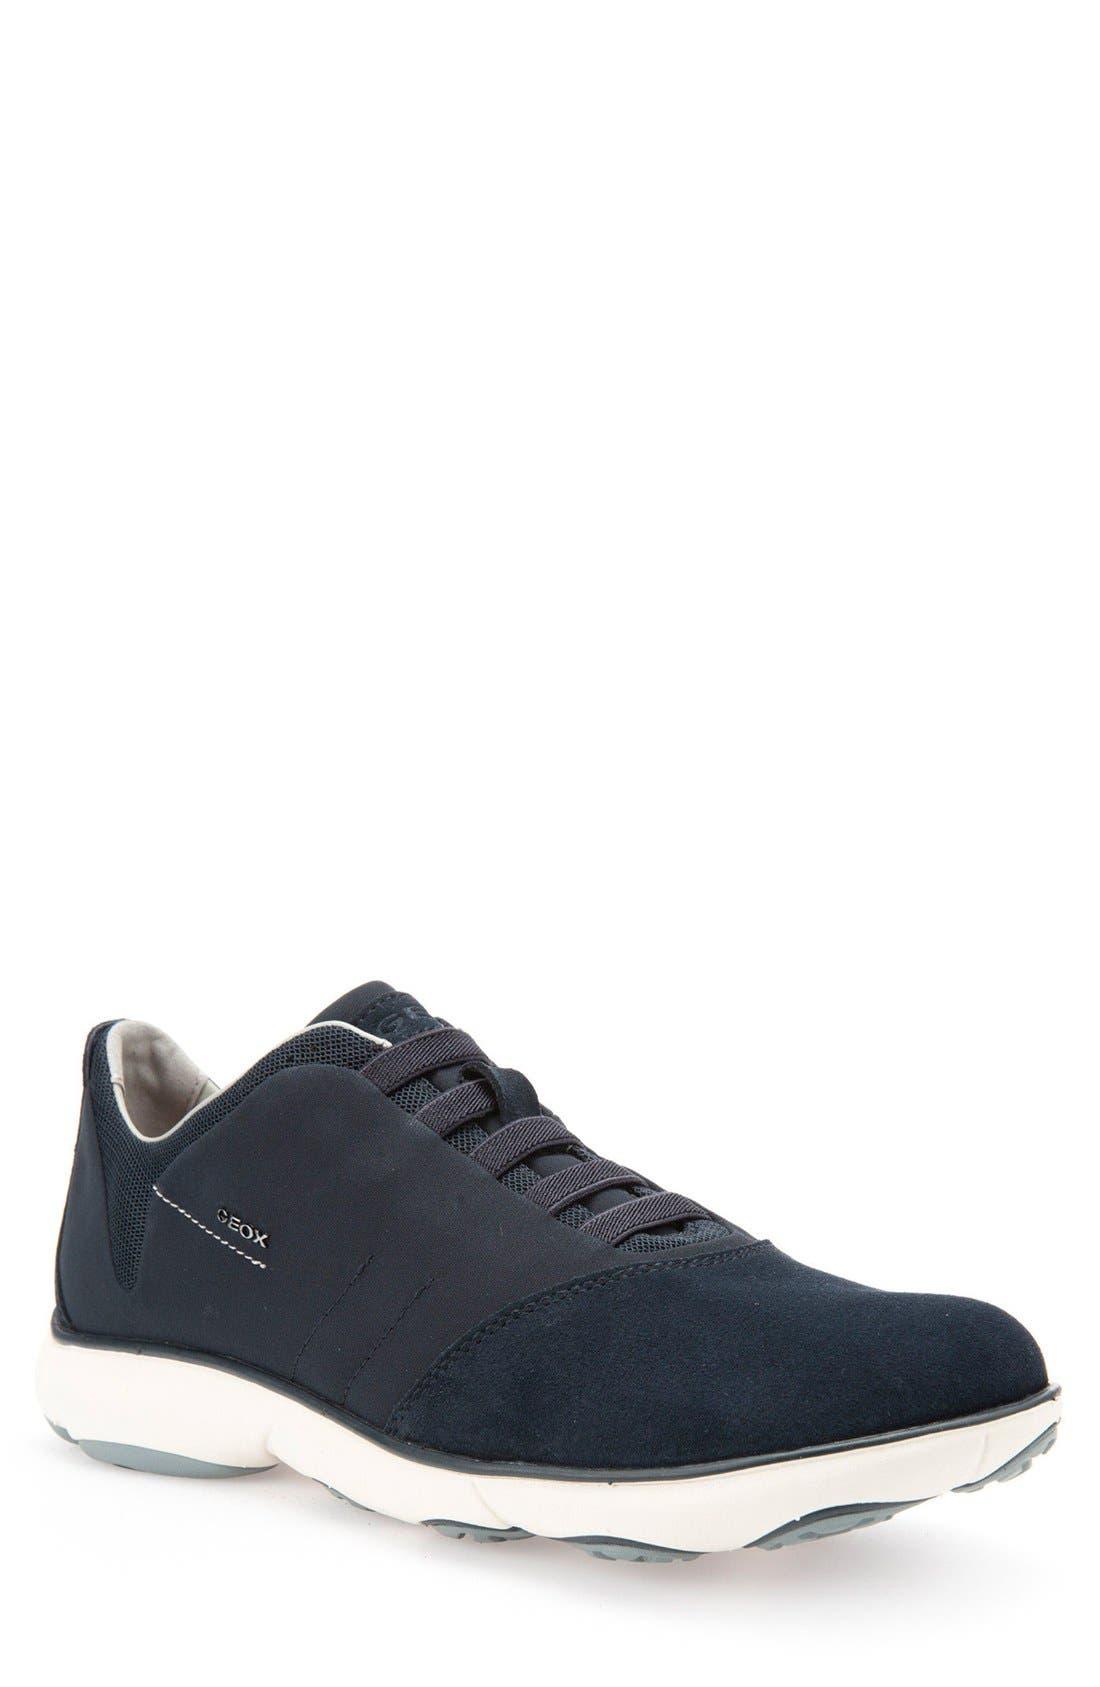 Nebula10 Slip-On Sneaker,                             Main thumbnail 1, color,                             NAVY SUEDE